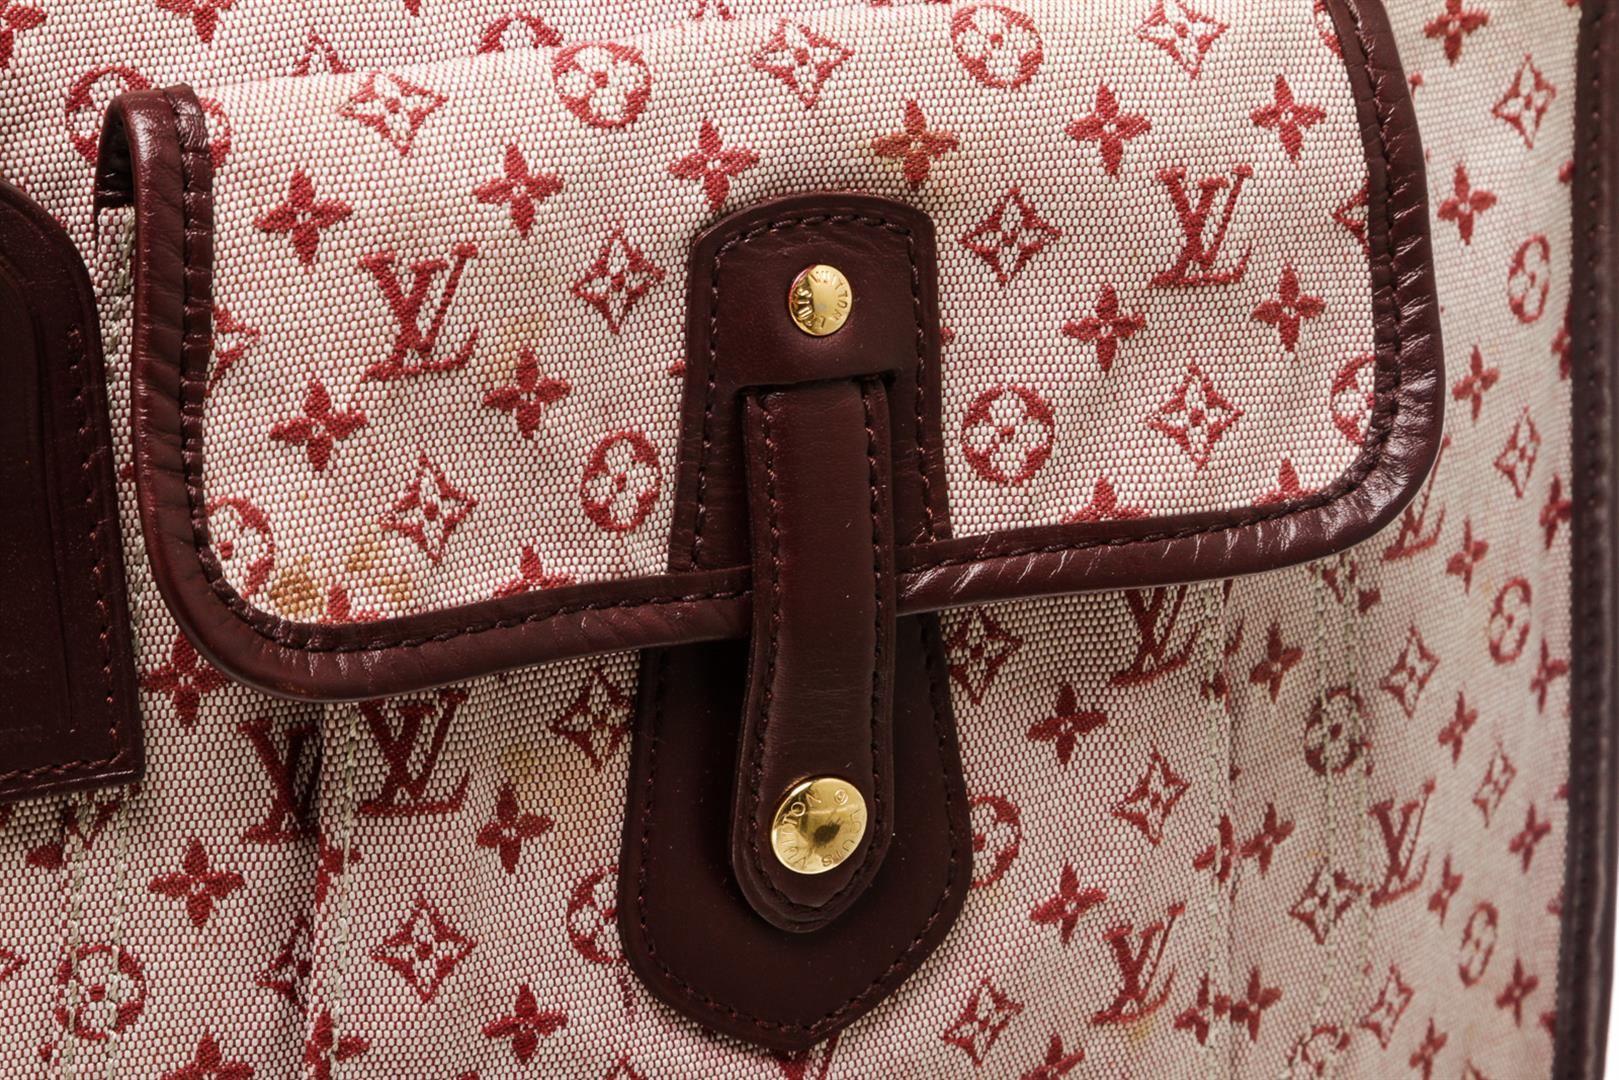 c41063d0 Louis Vuitton Burgundy Mini Monogram Canvas Leather Besace Mary Kate  Crossbody B